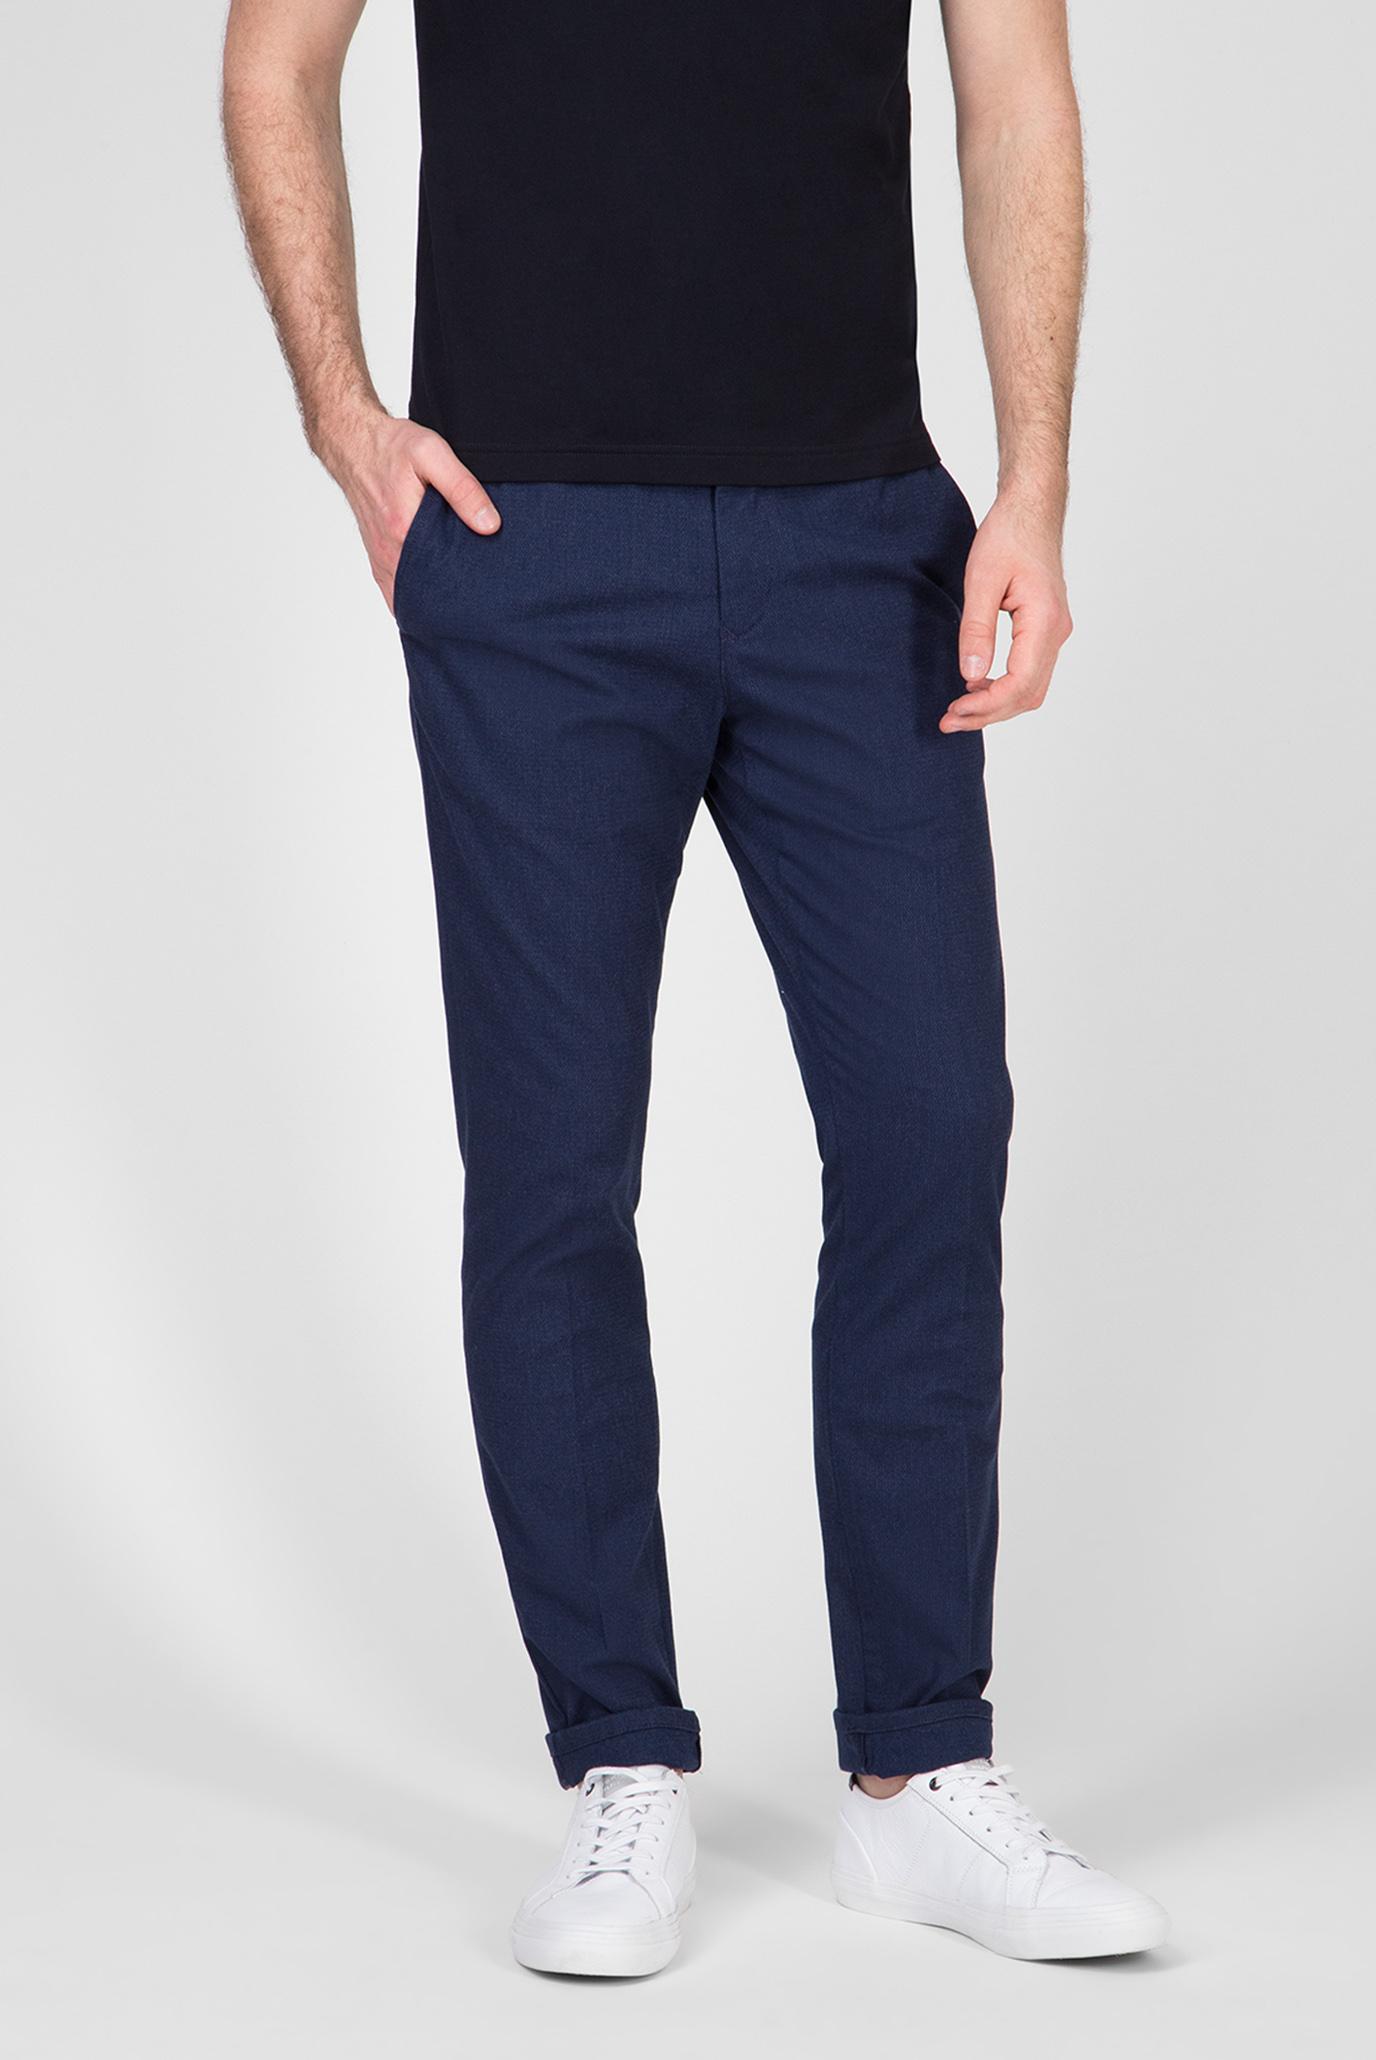 Мужские синие брюки ACTIVE TH FLEX STRETCH MELANGE 1